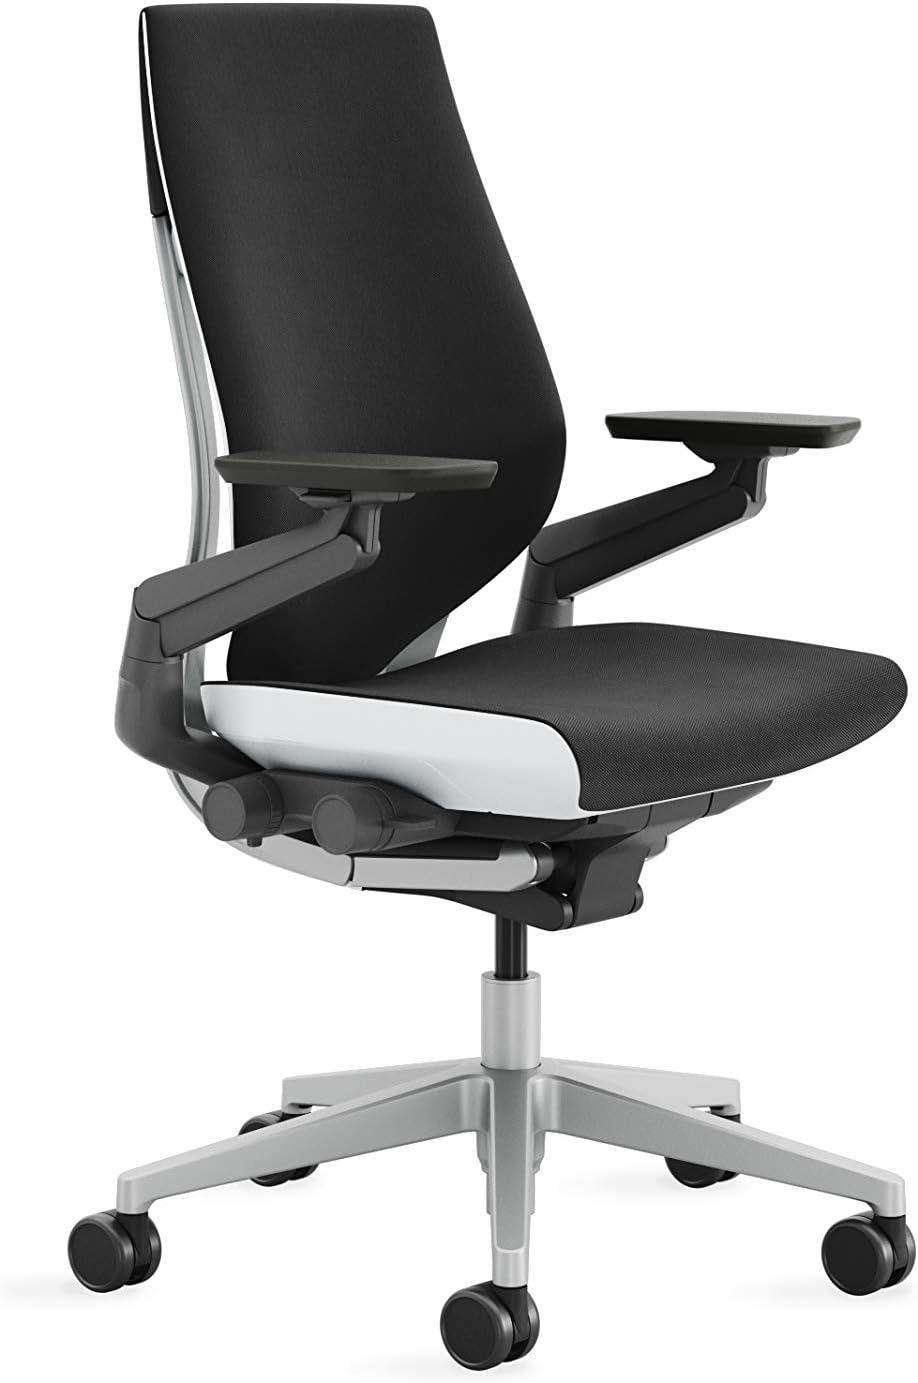 Best Computer Chair